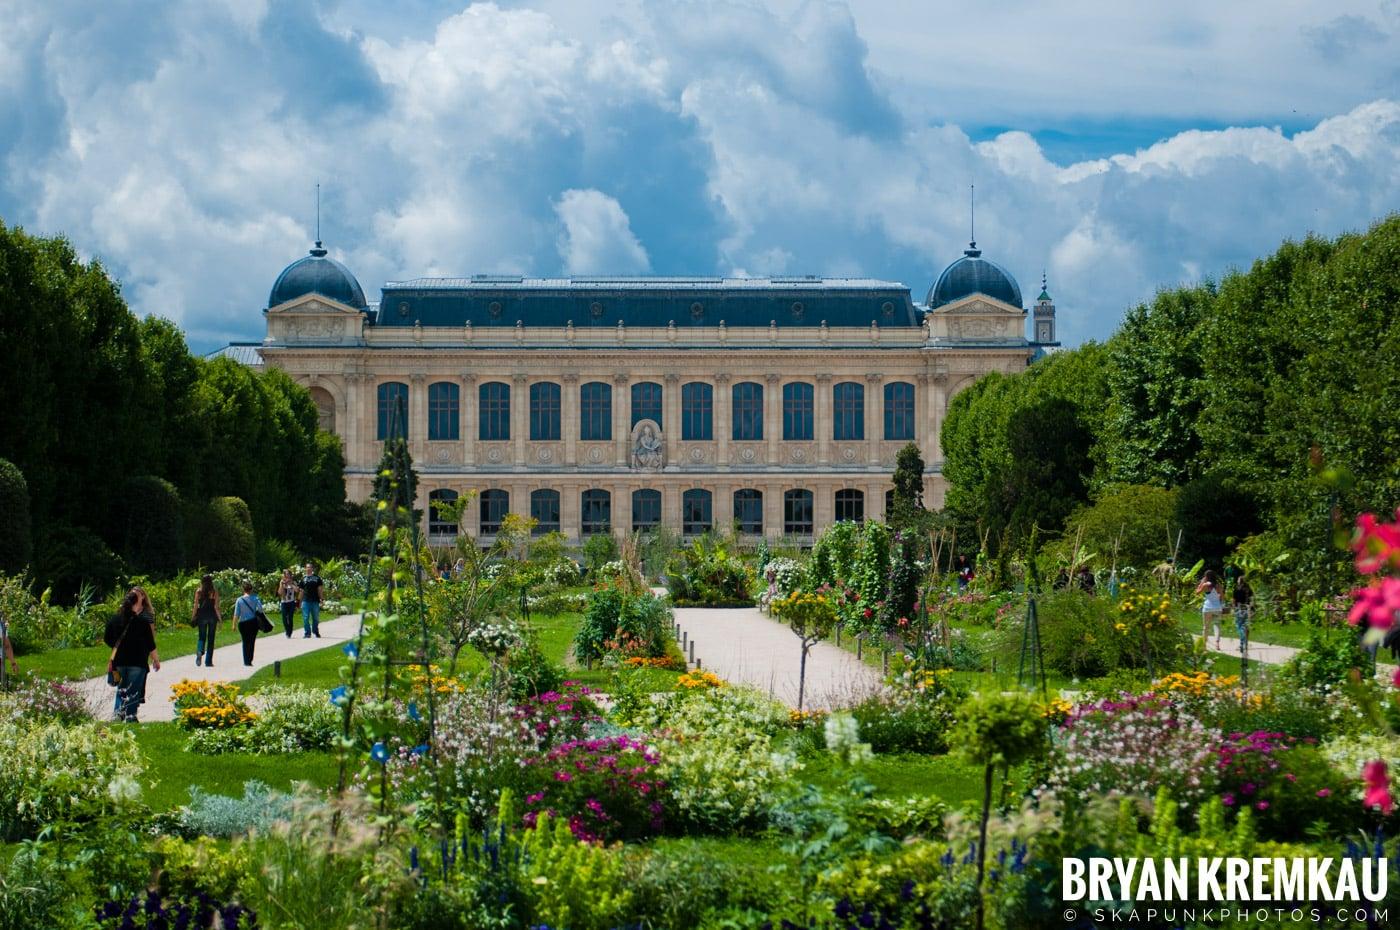 Paris, France Honeymoon - Day 8 - 7.25.11 (15)